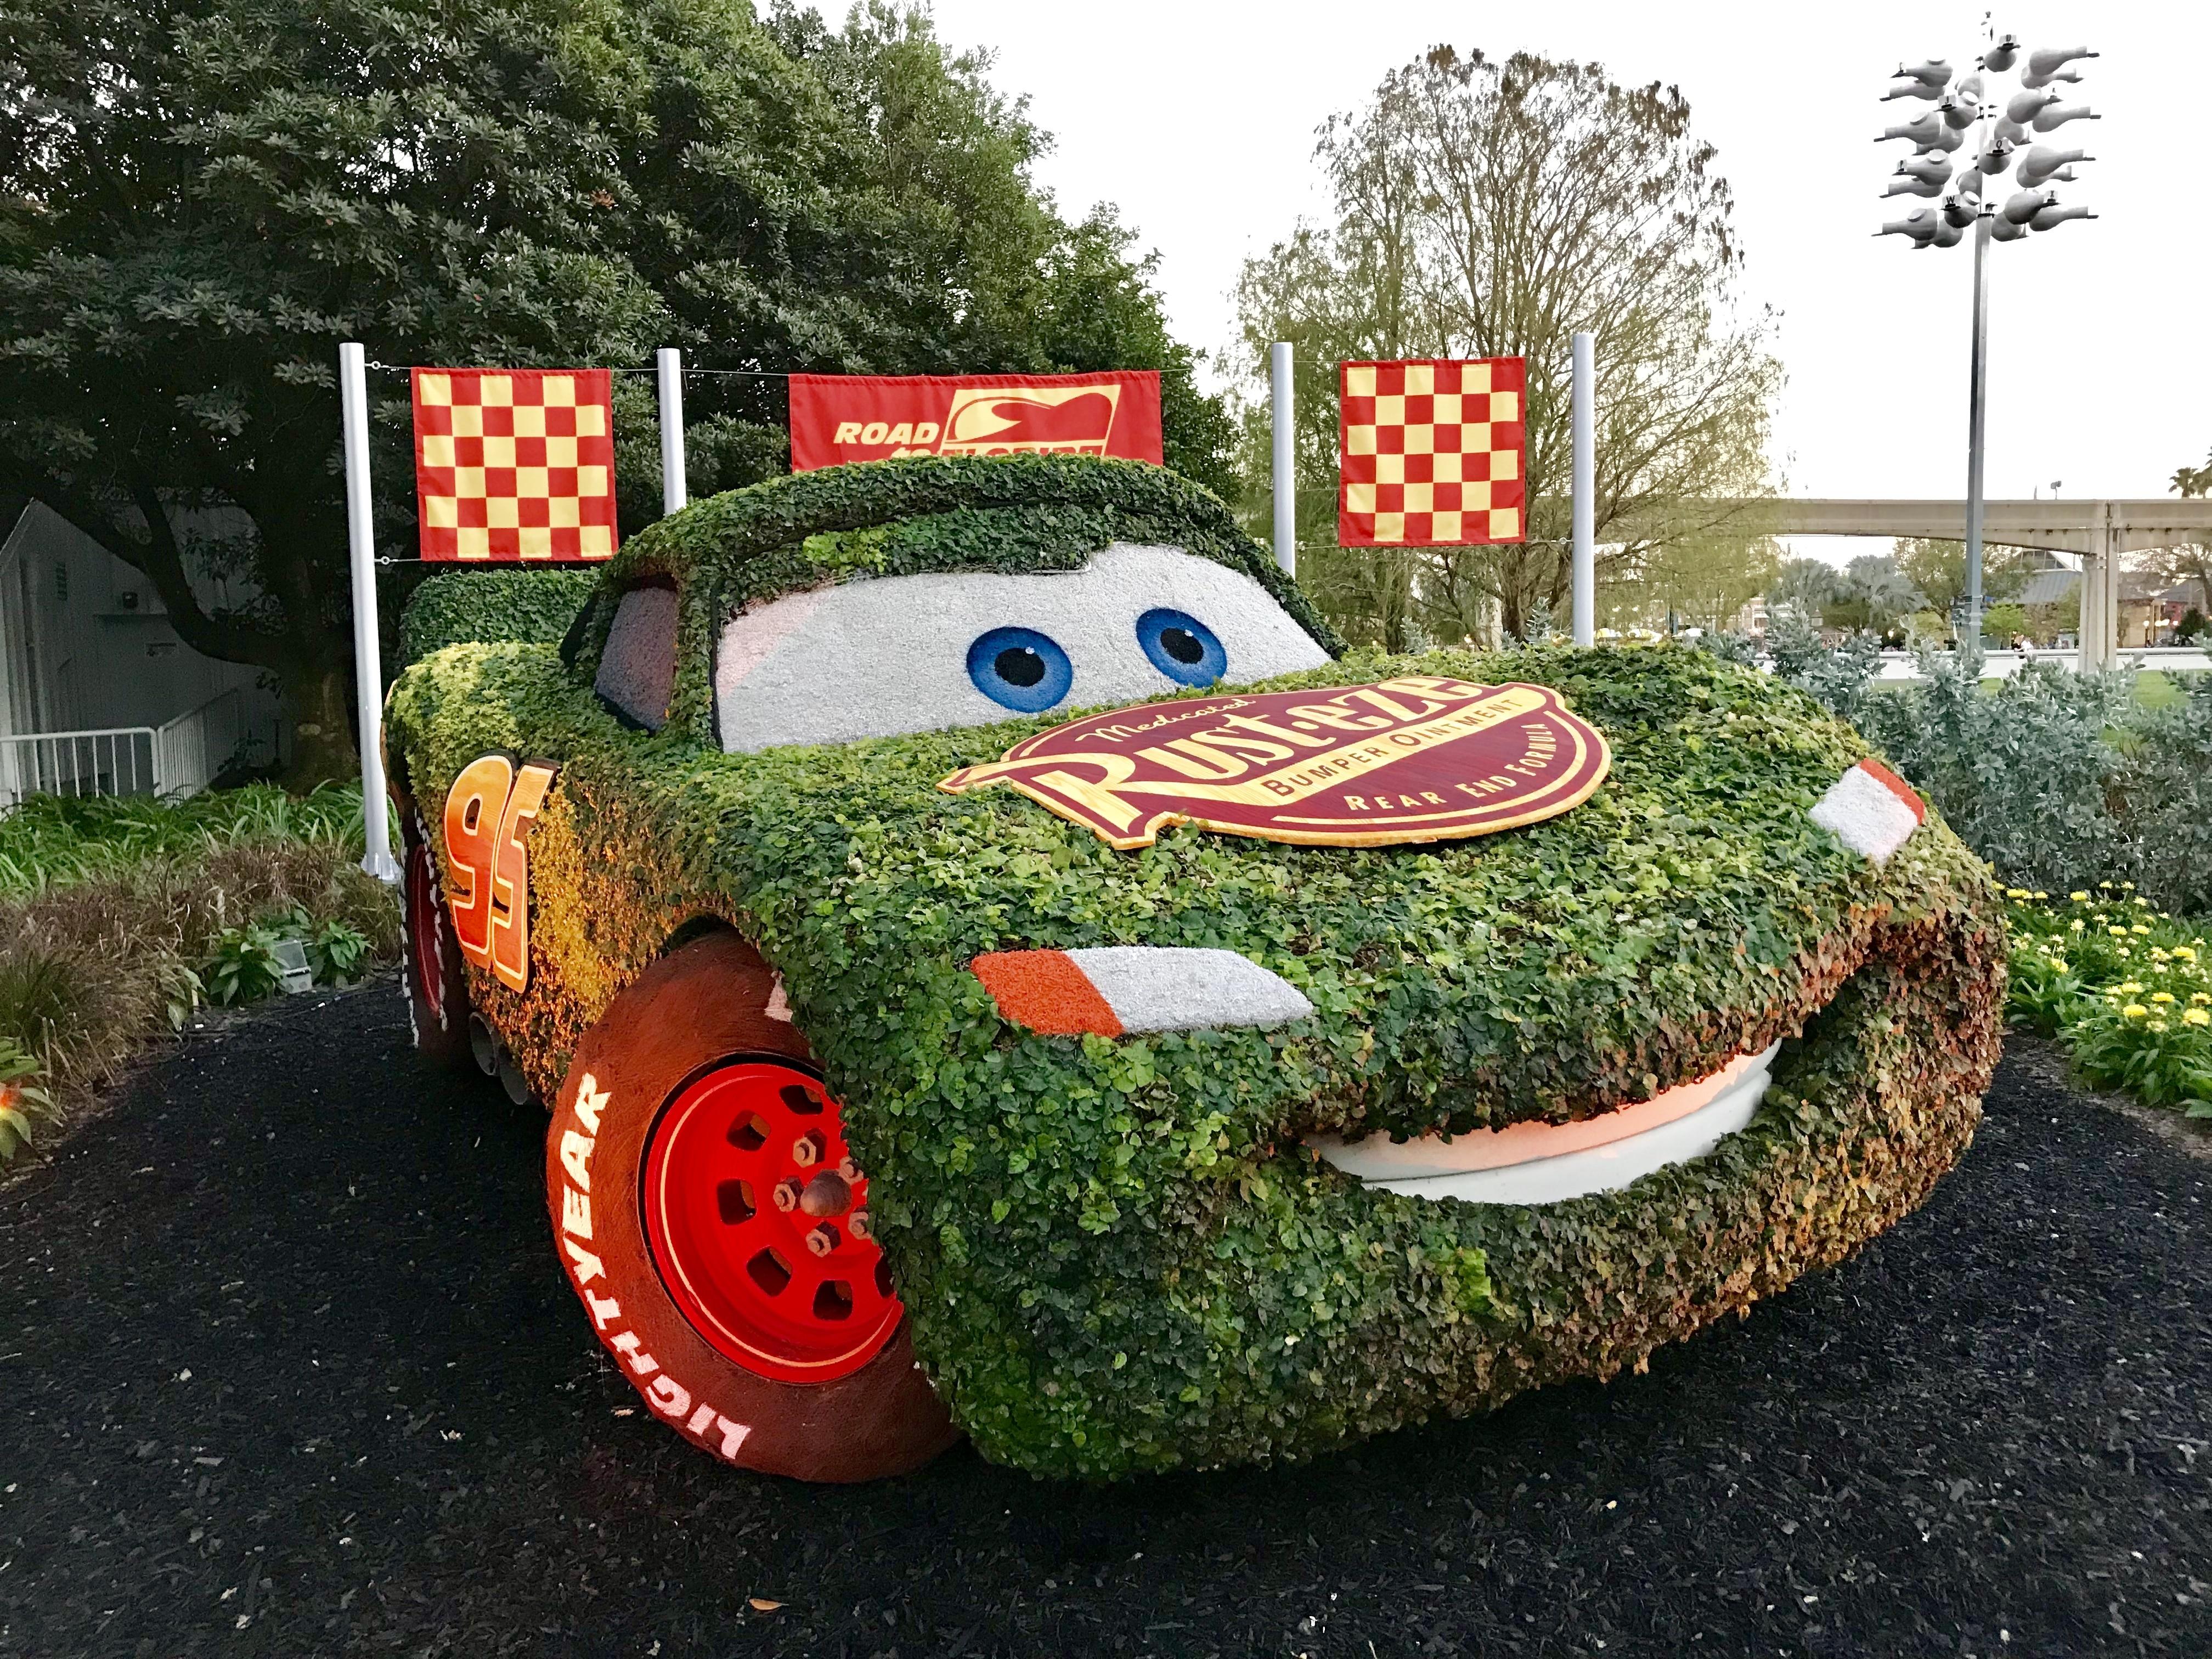 Lighting McQueen at Disney's Epcot Flower and Garden Festival 2018